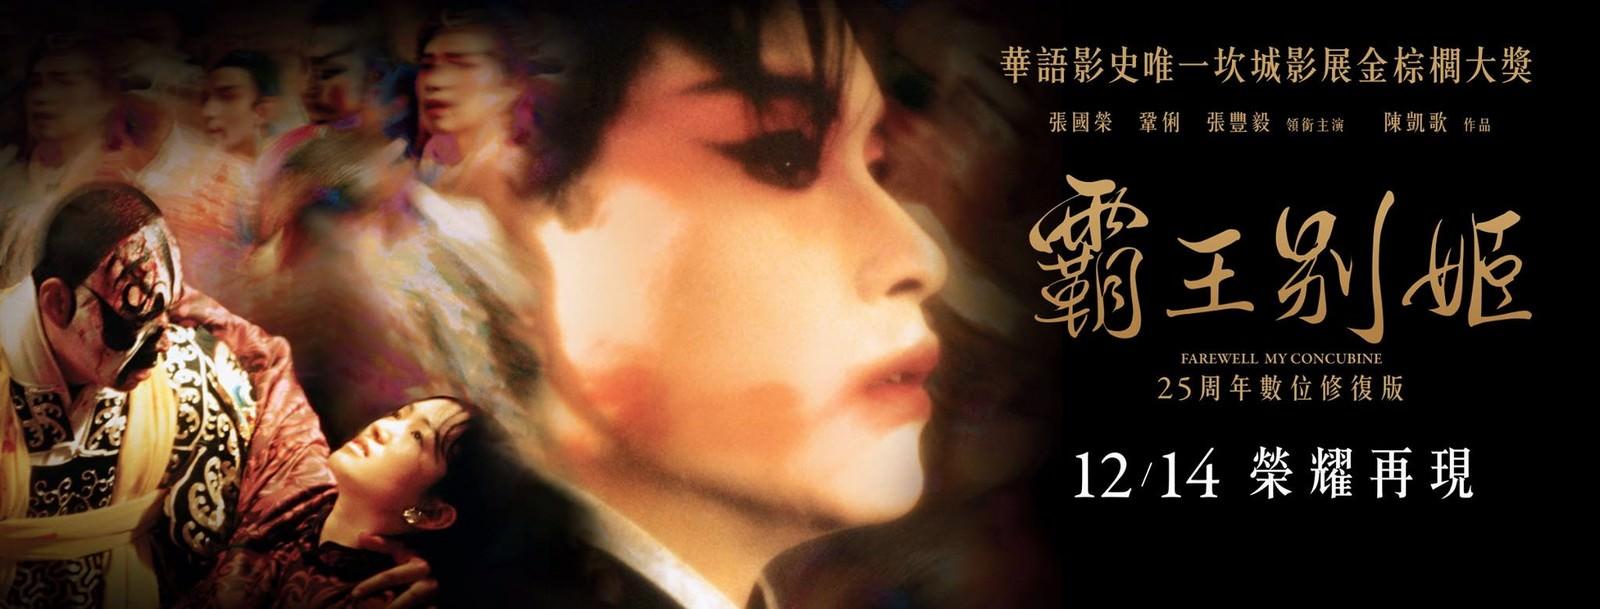 Movie, 霸王别姬(中國, 1993年) / 霸王別姬(台灣) / Farewell My Concubine(英文), 電影海報, 台灣, 25周年數位修復版, 橫版(非正式)